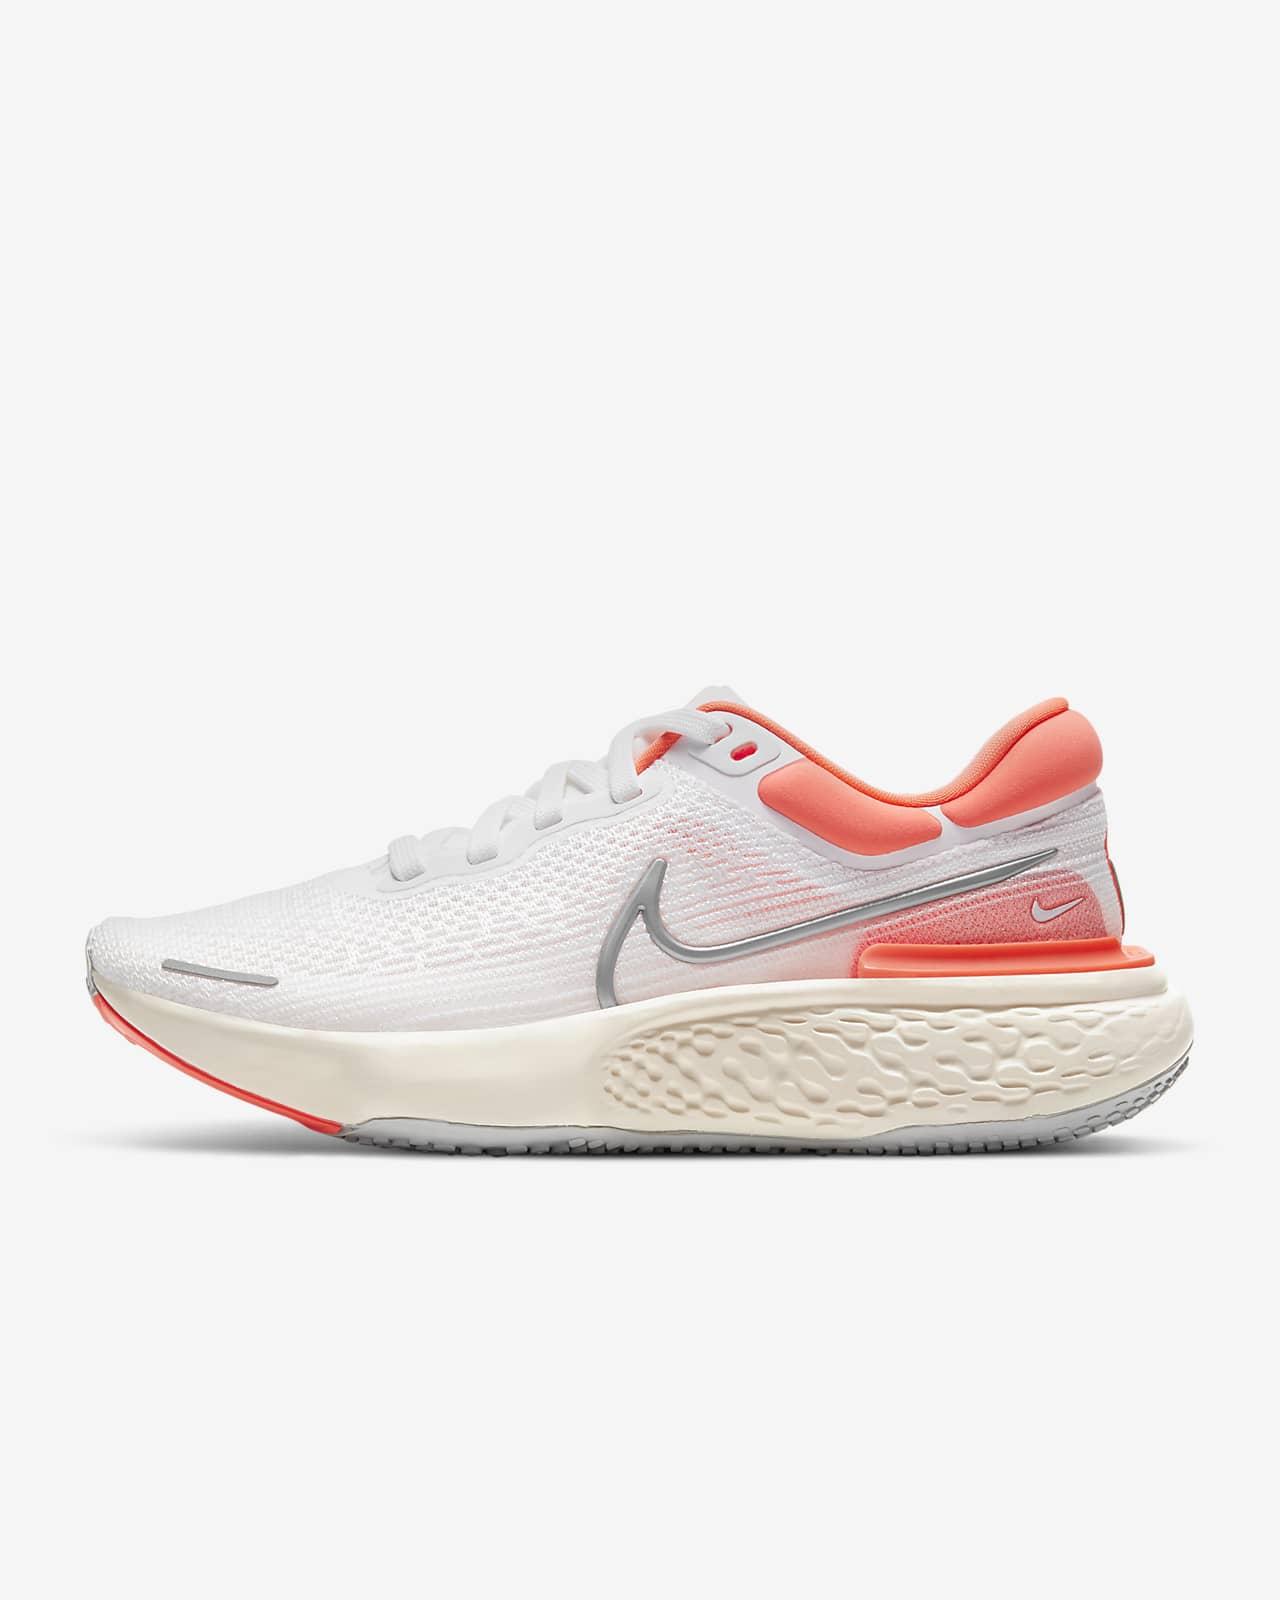 Nike ZoomX Invincible Run Flyknit Women's Road Running Shoes